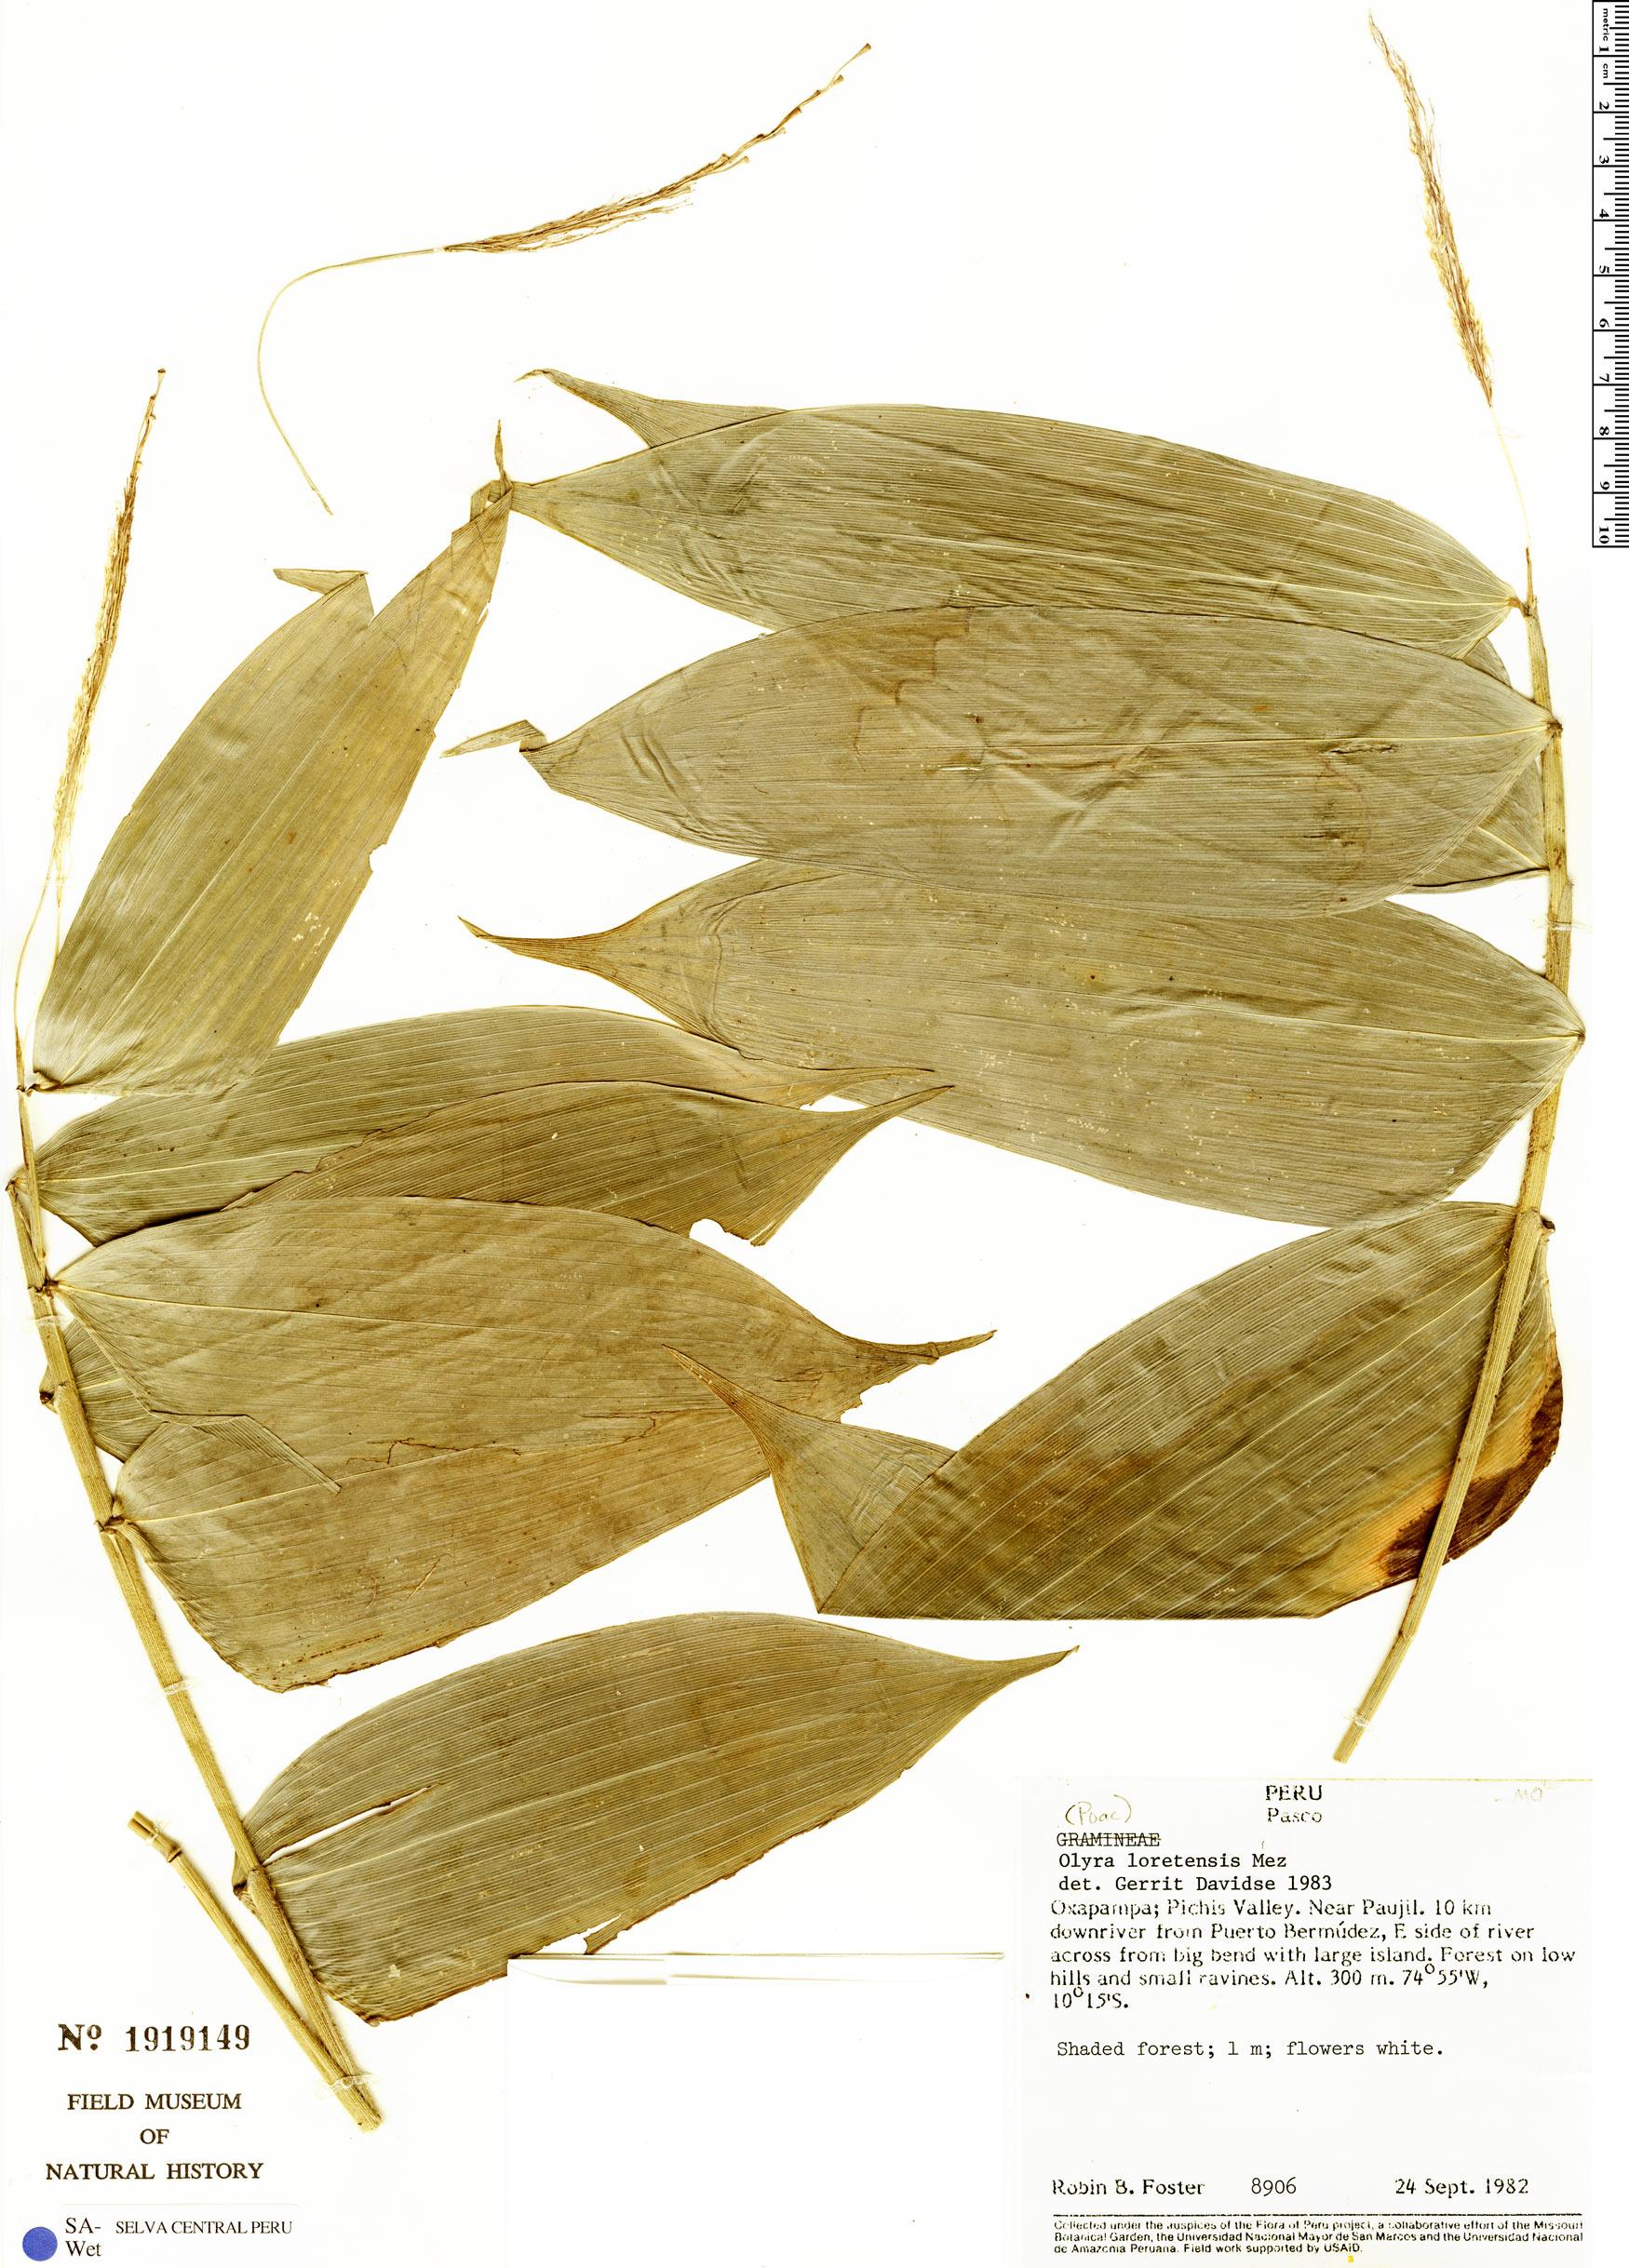 Specimen: Olyra maranonensis